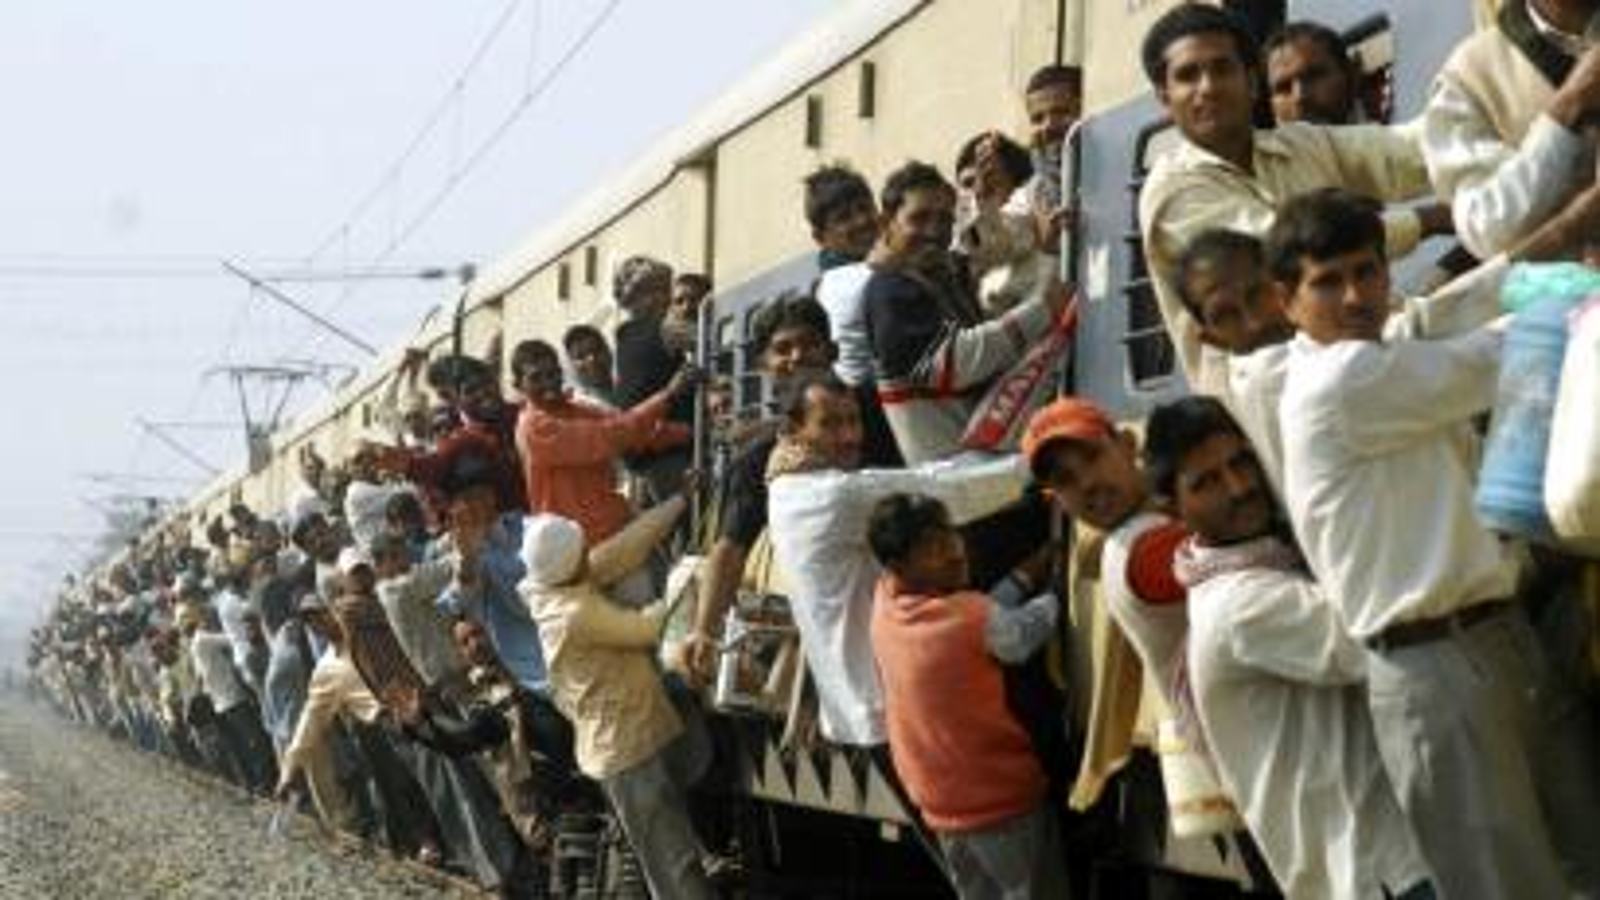 India is unprepared for a near future when it will be the world's